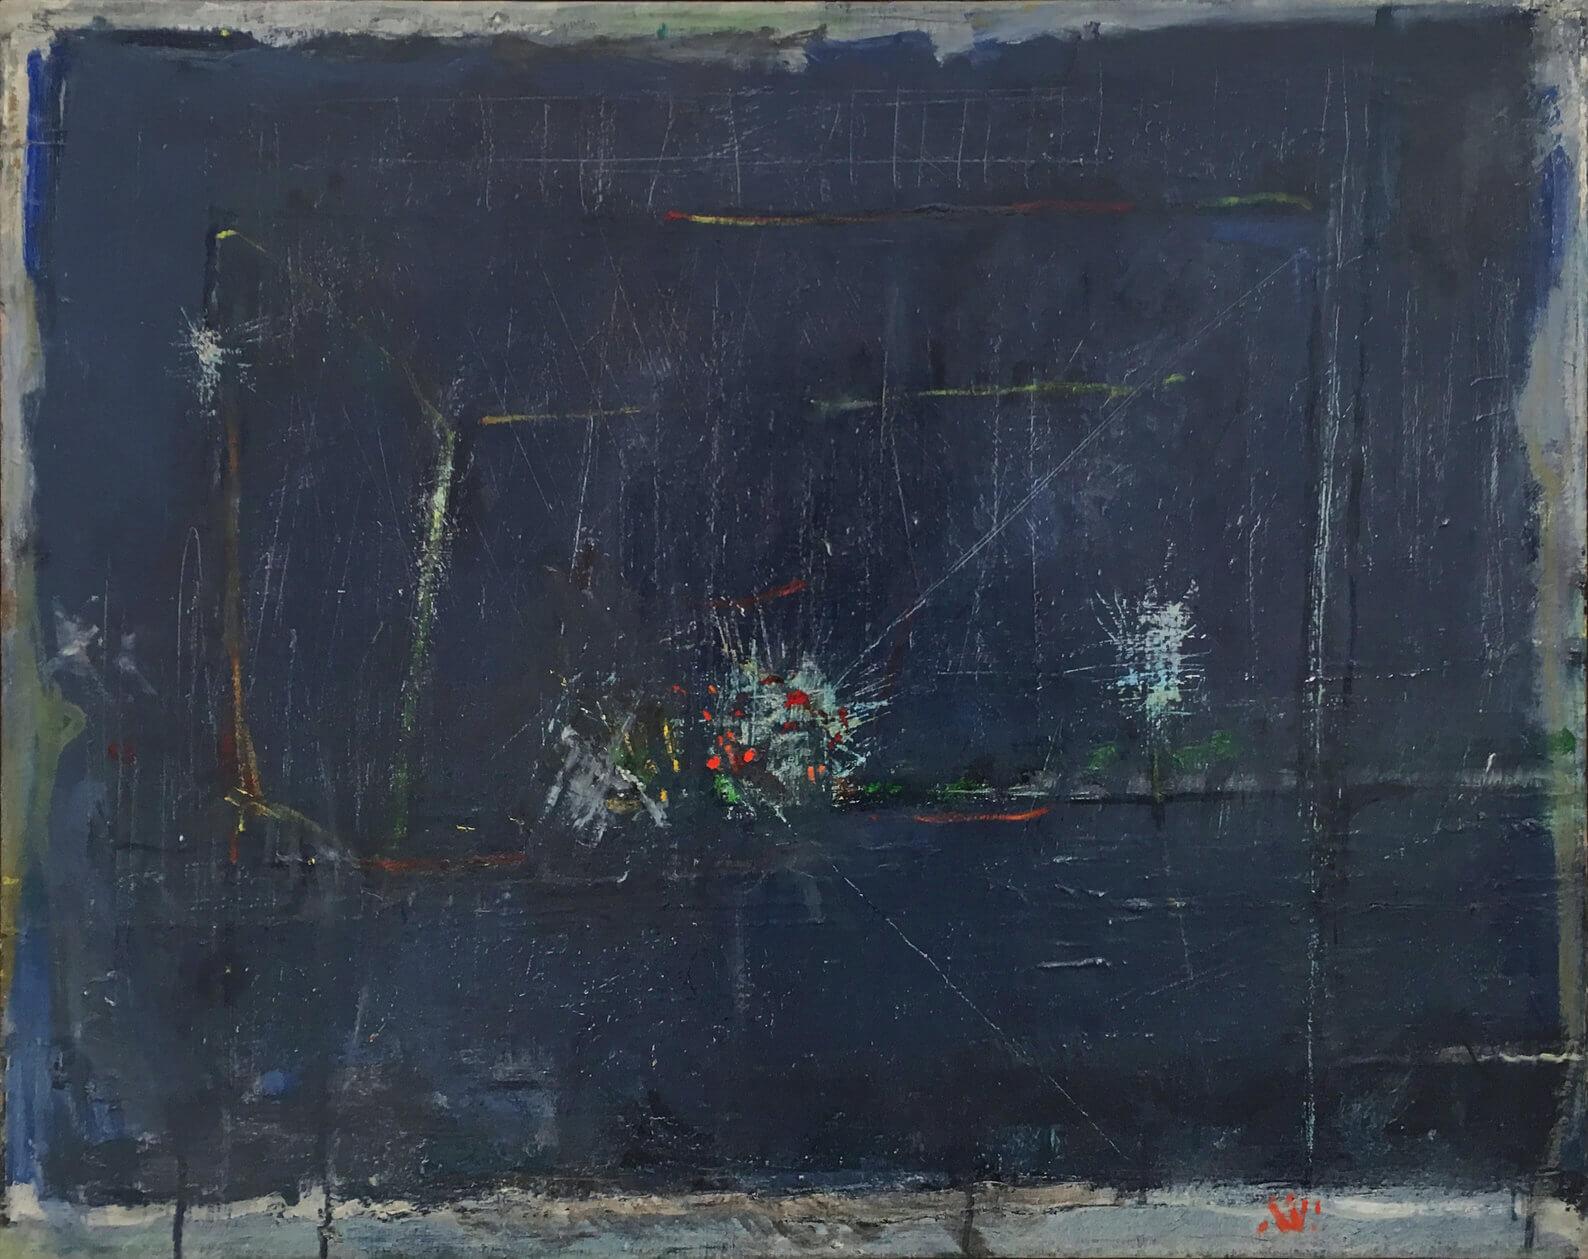 1475_Yehezkel Streichman, 1965, Oil on canvas, 65x81 cm 9,500$-1588x1259